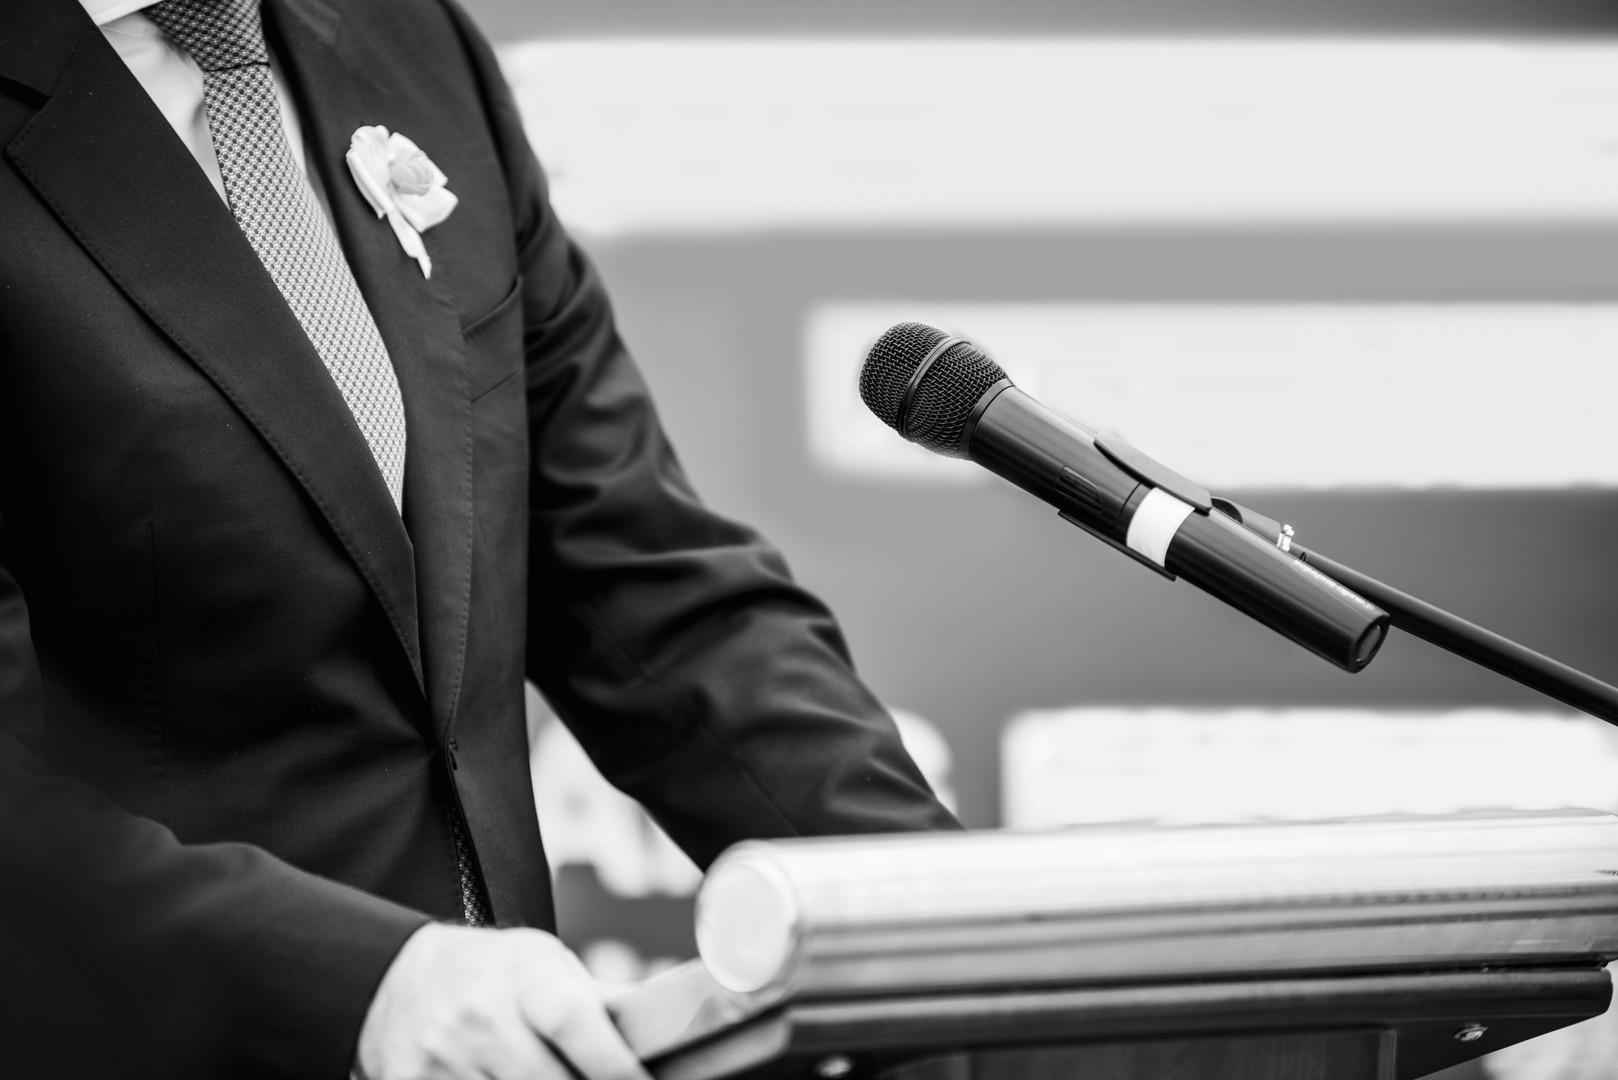 businessman-during-press-conference-N4DK